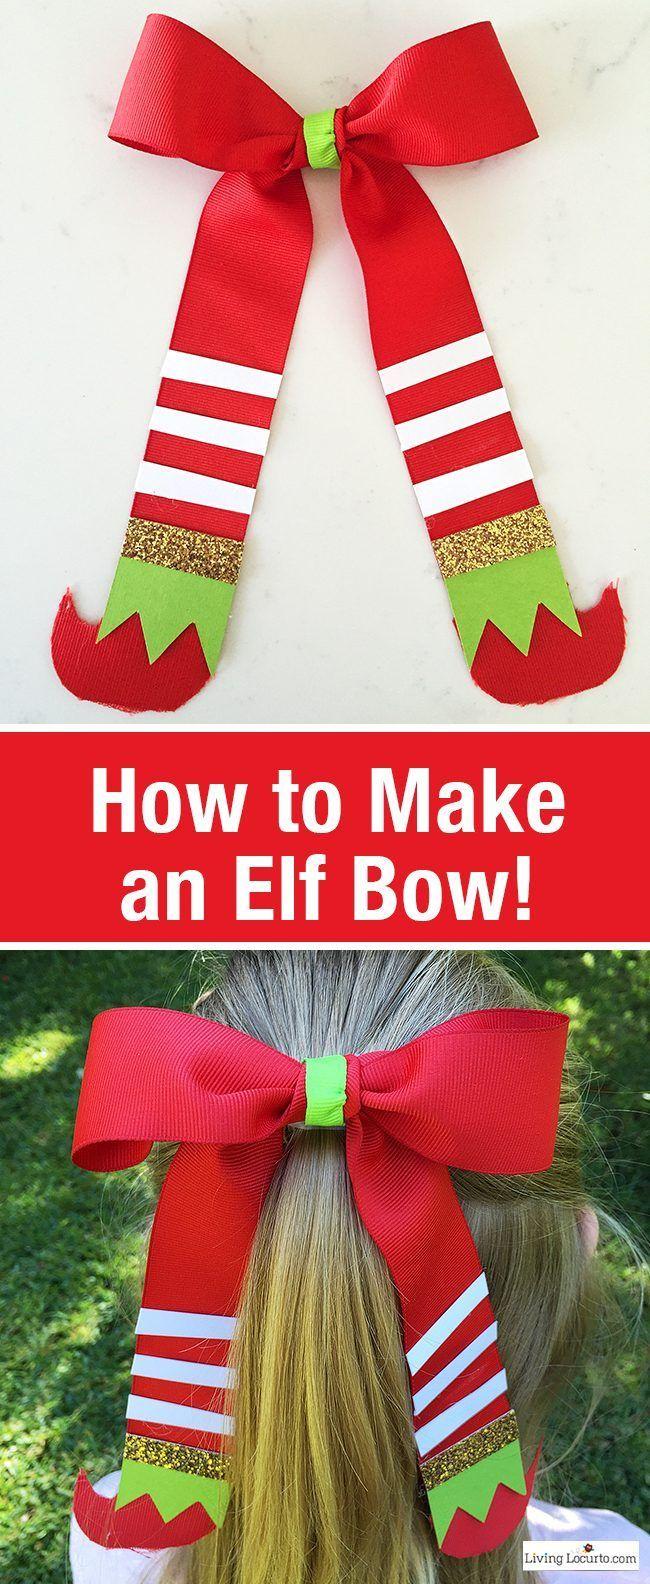 How To Make An Elf Hair Bow Christmas Bows Diy Christmas Hair Bows Christmas Bows